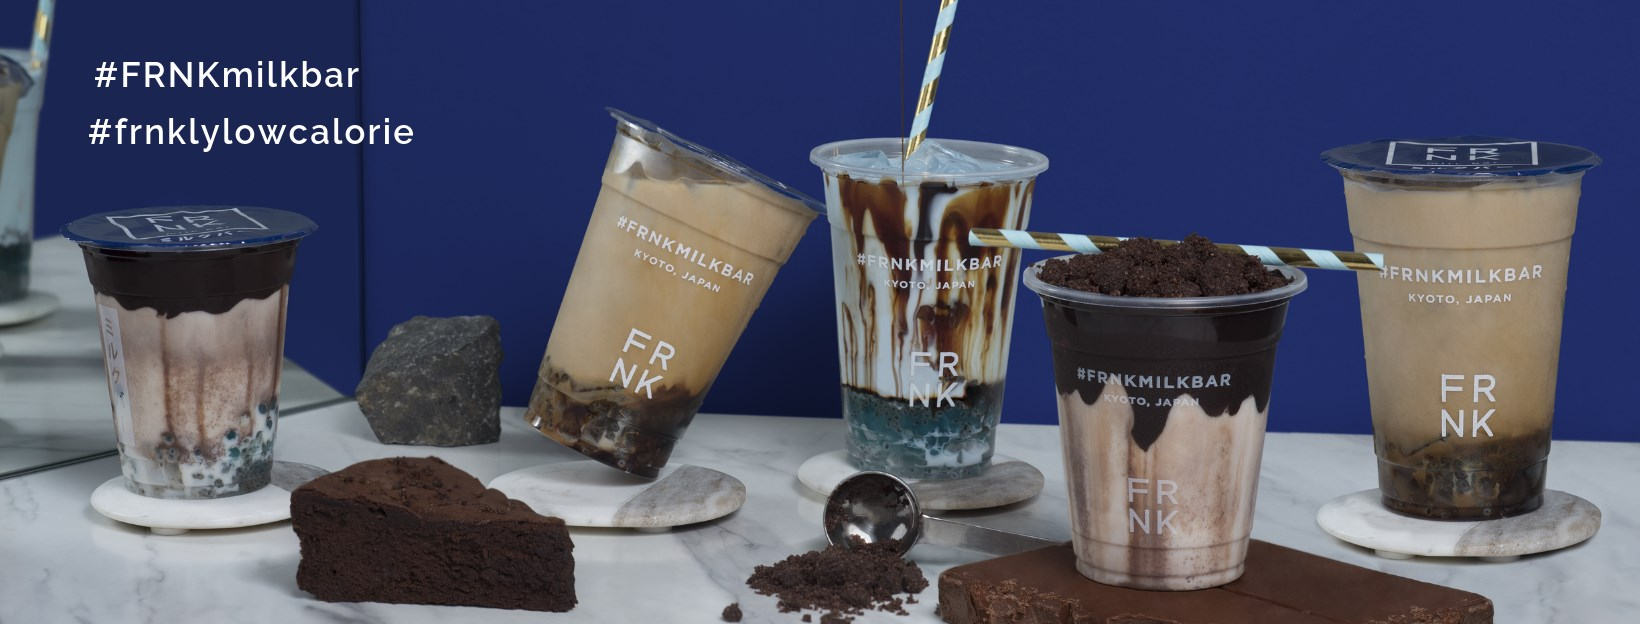 FRNK Milk Bar Best Sellers